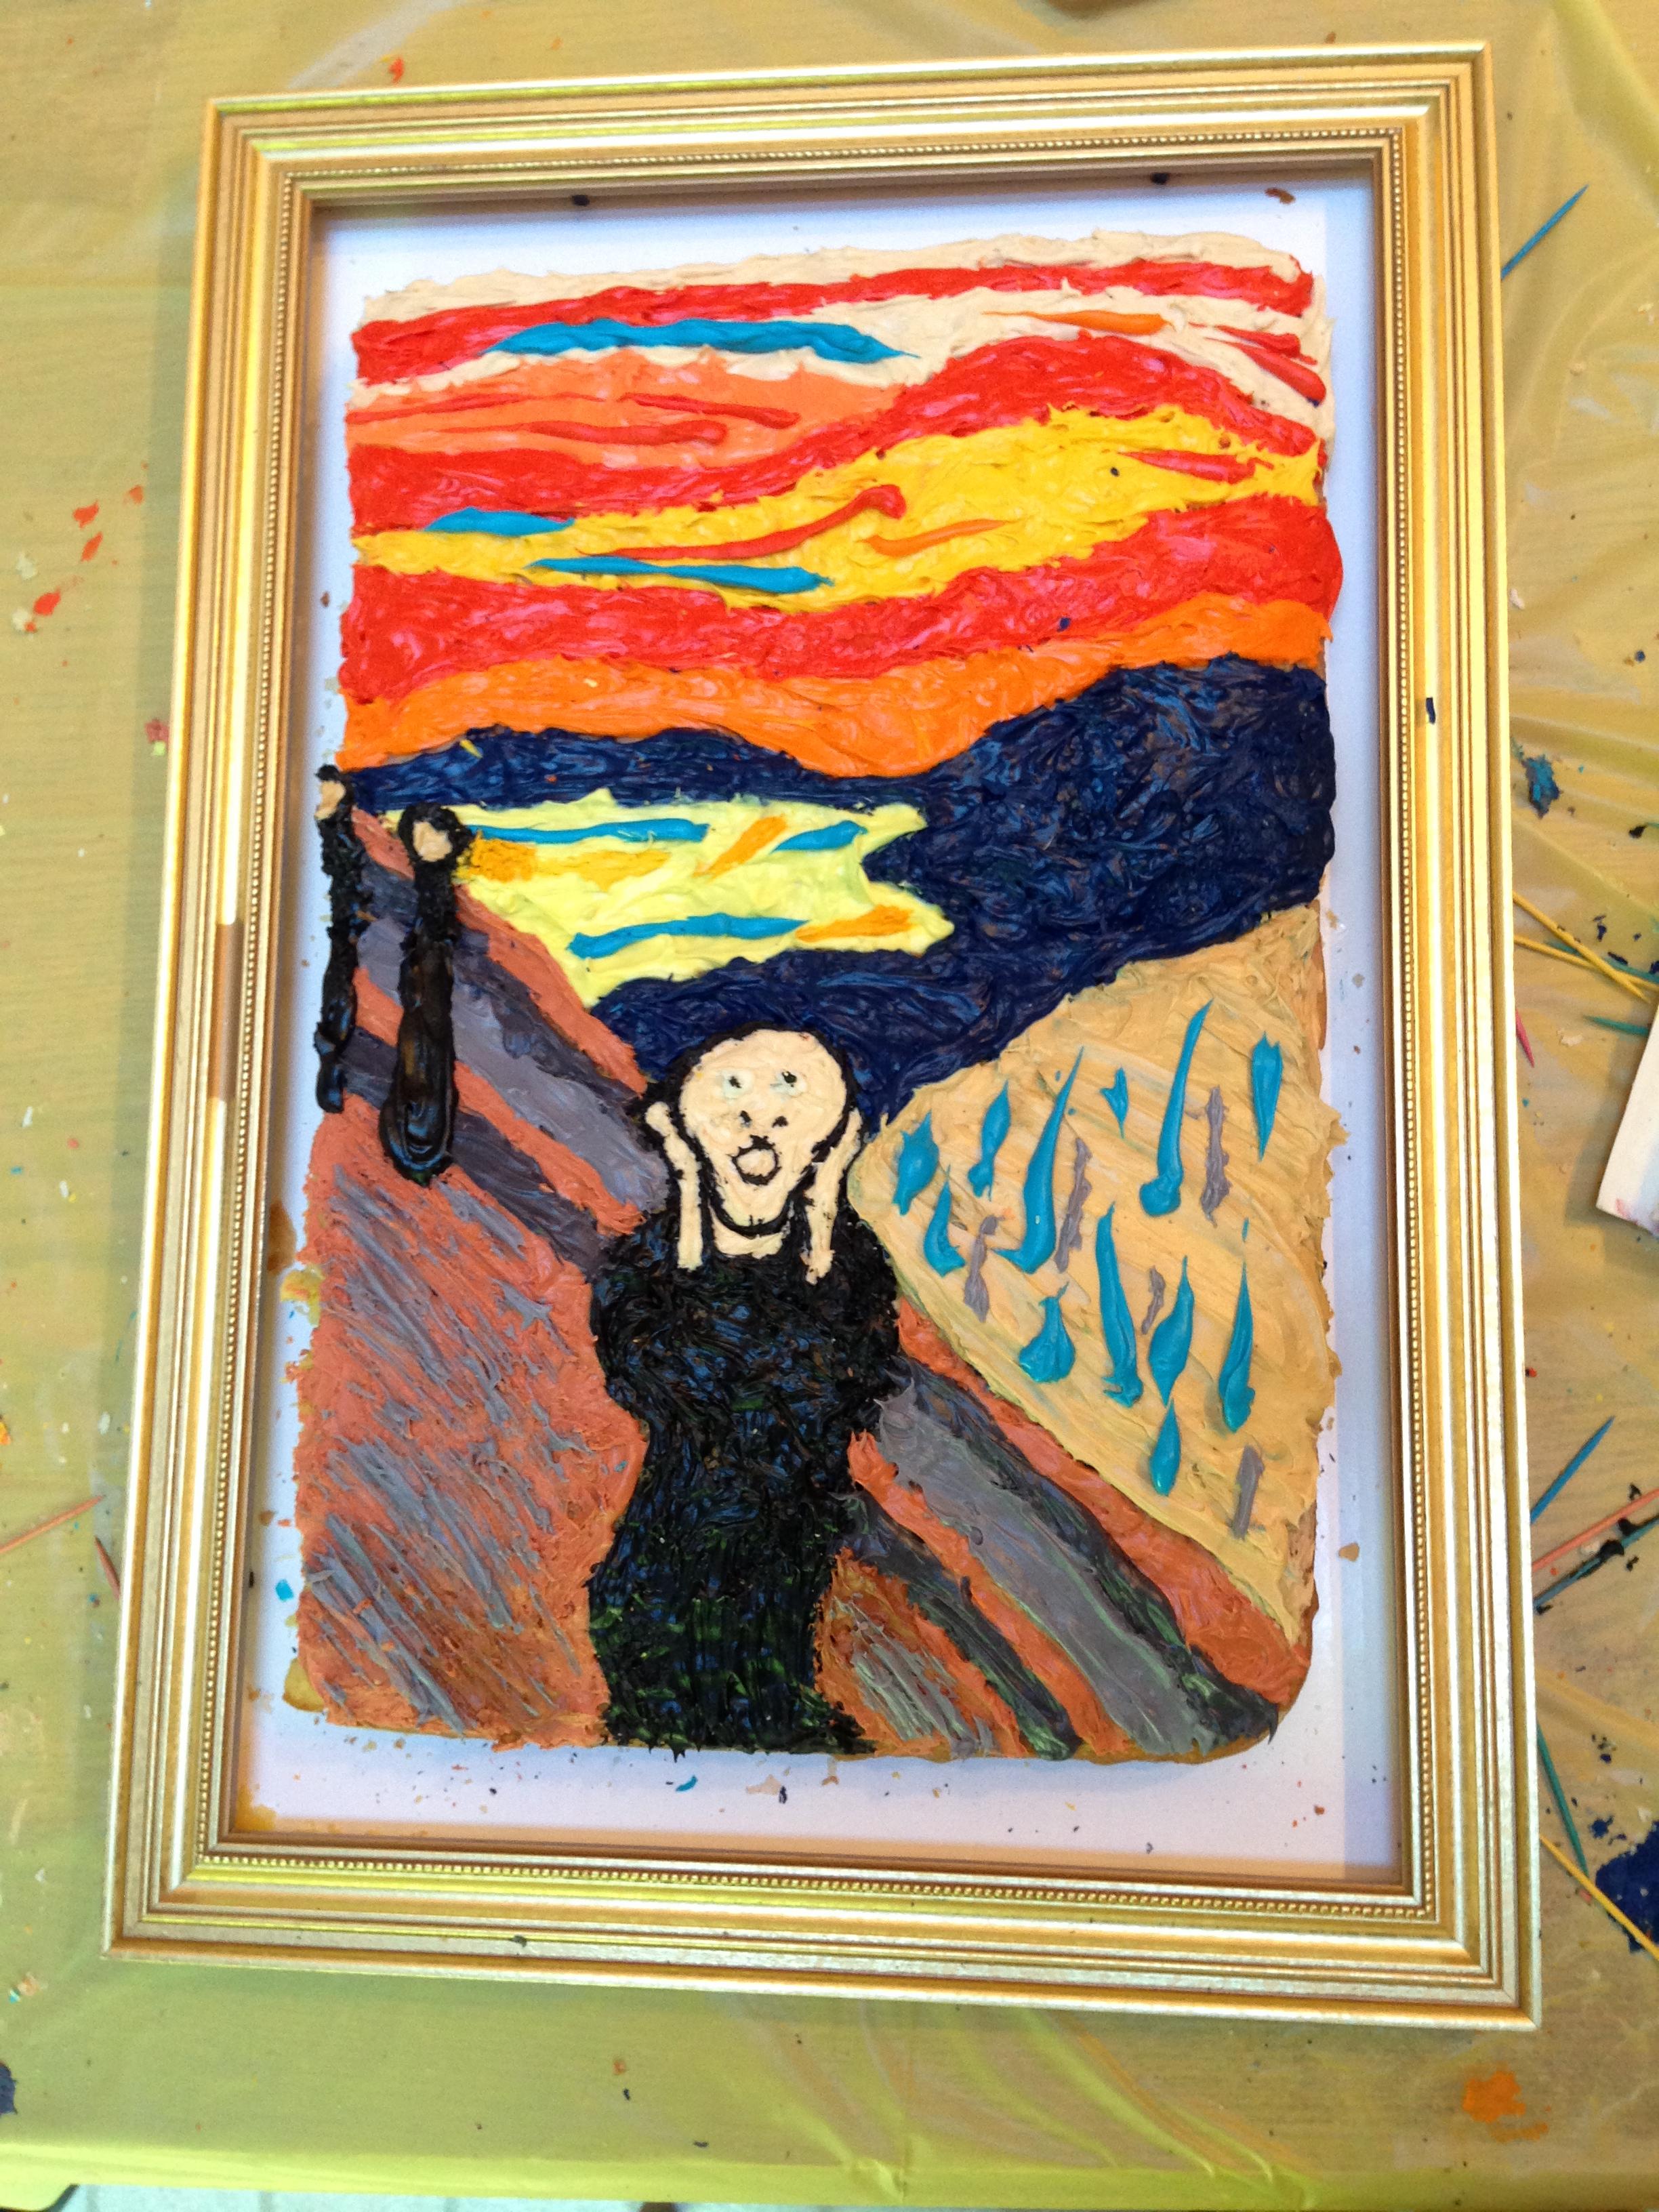 Van Gogh Year 2 Photo